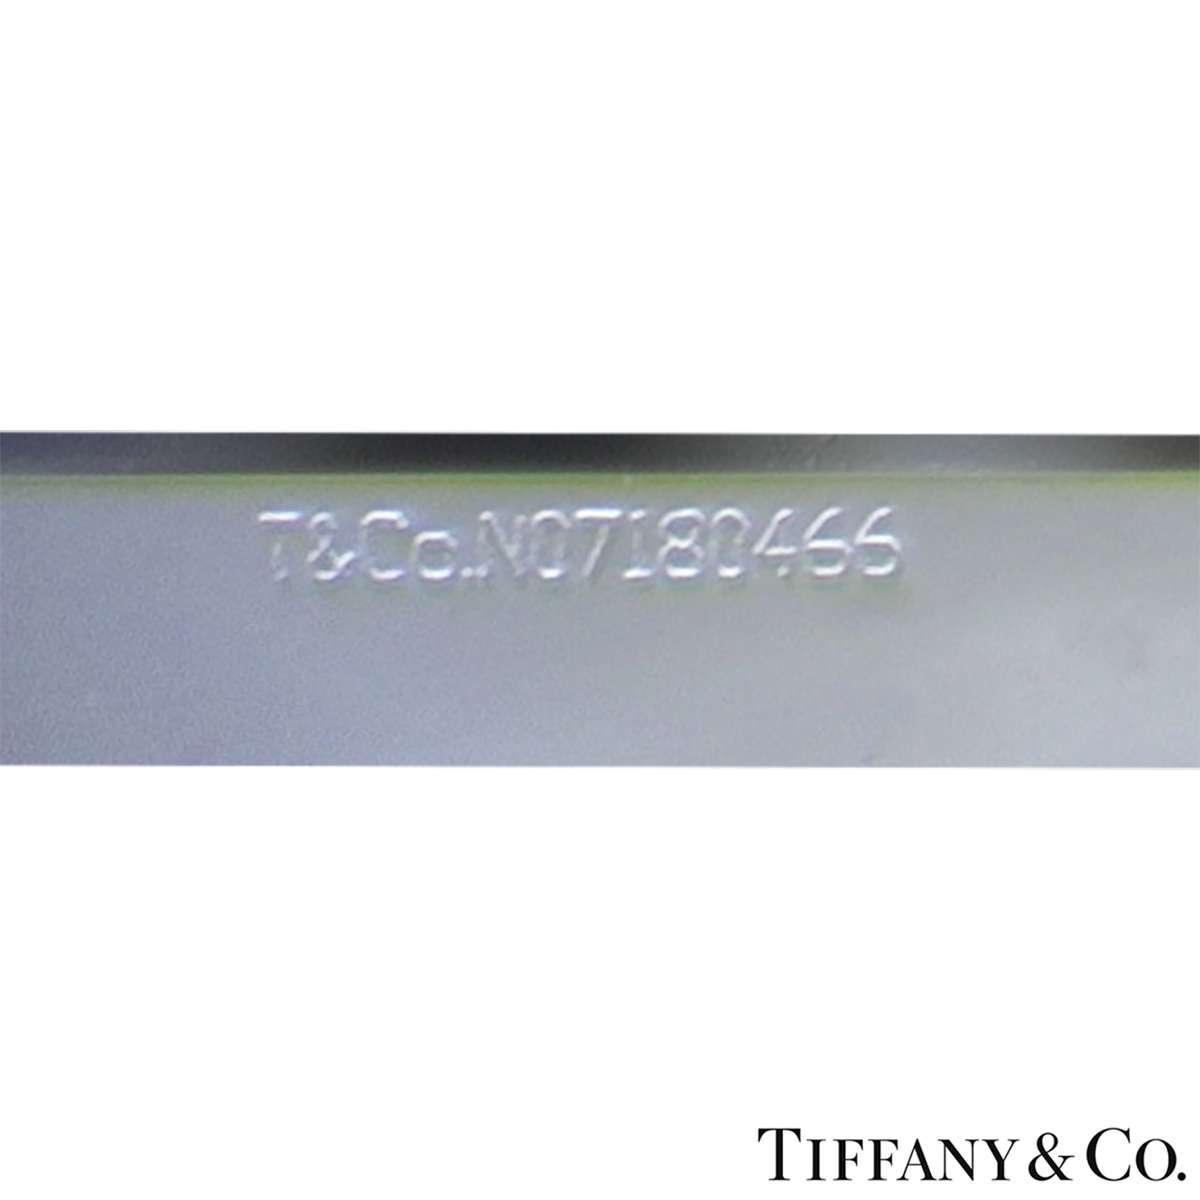 Tiffany & Co. Platinum Cushion Cut Diamond Novo Ring 2.22ct G/VVS1